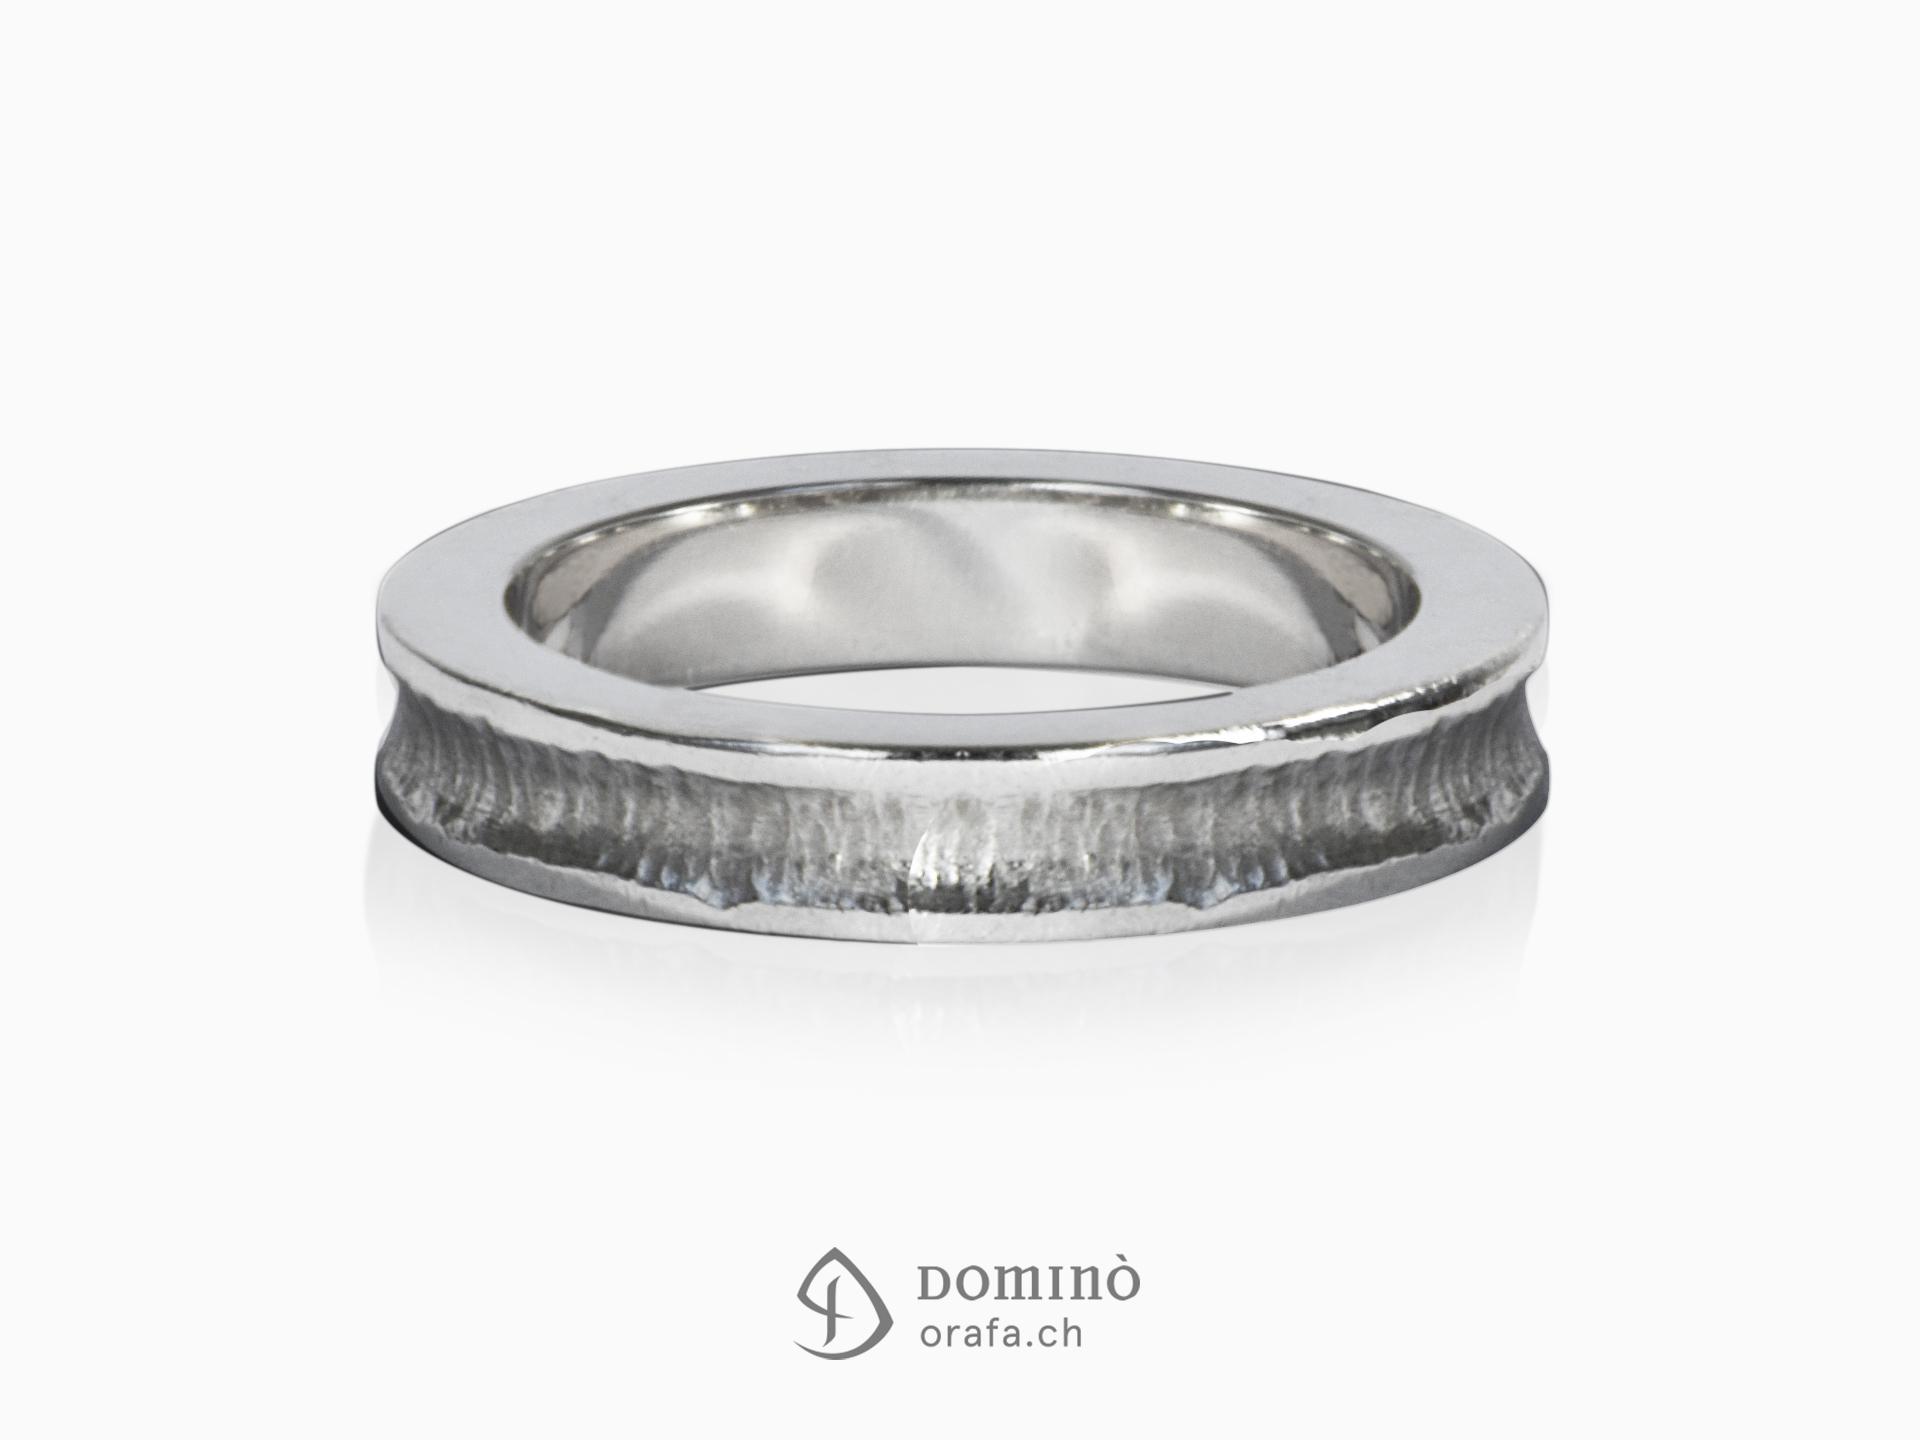 Conca rings